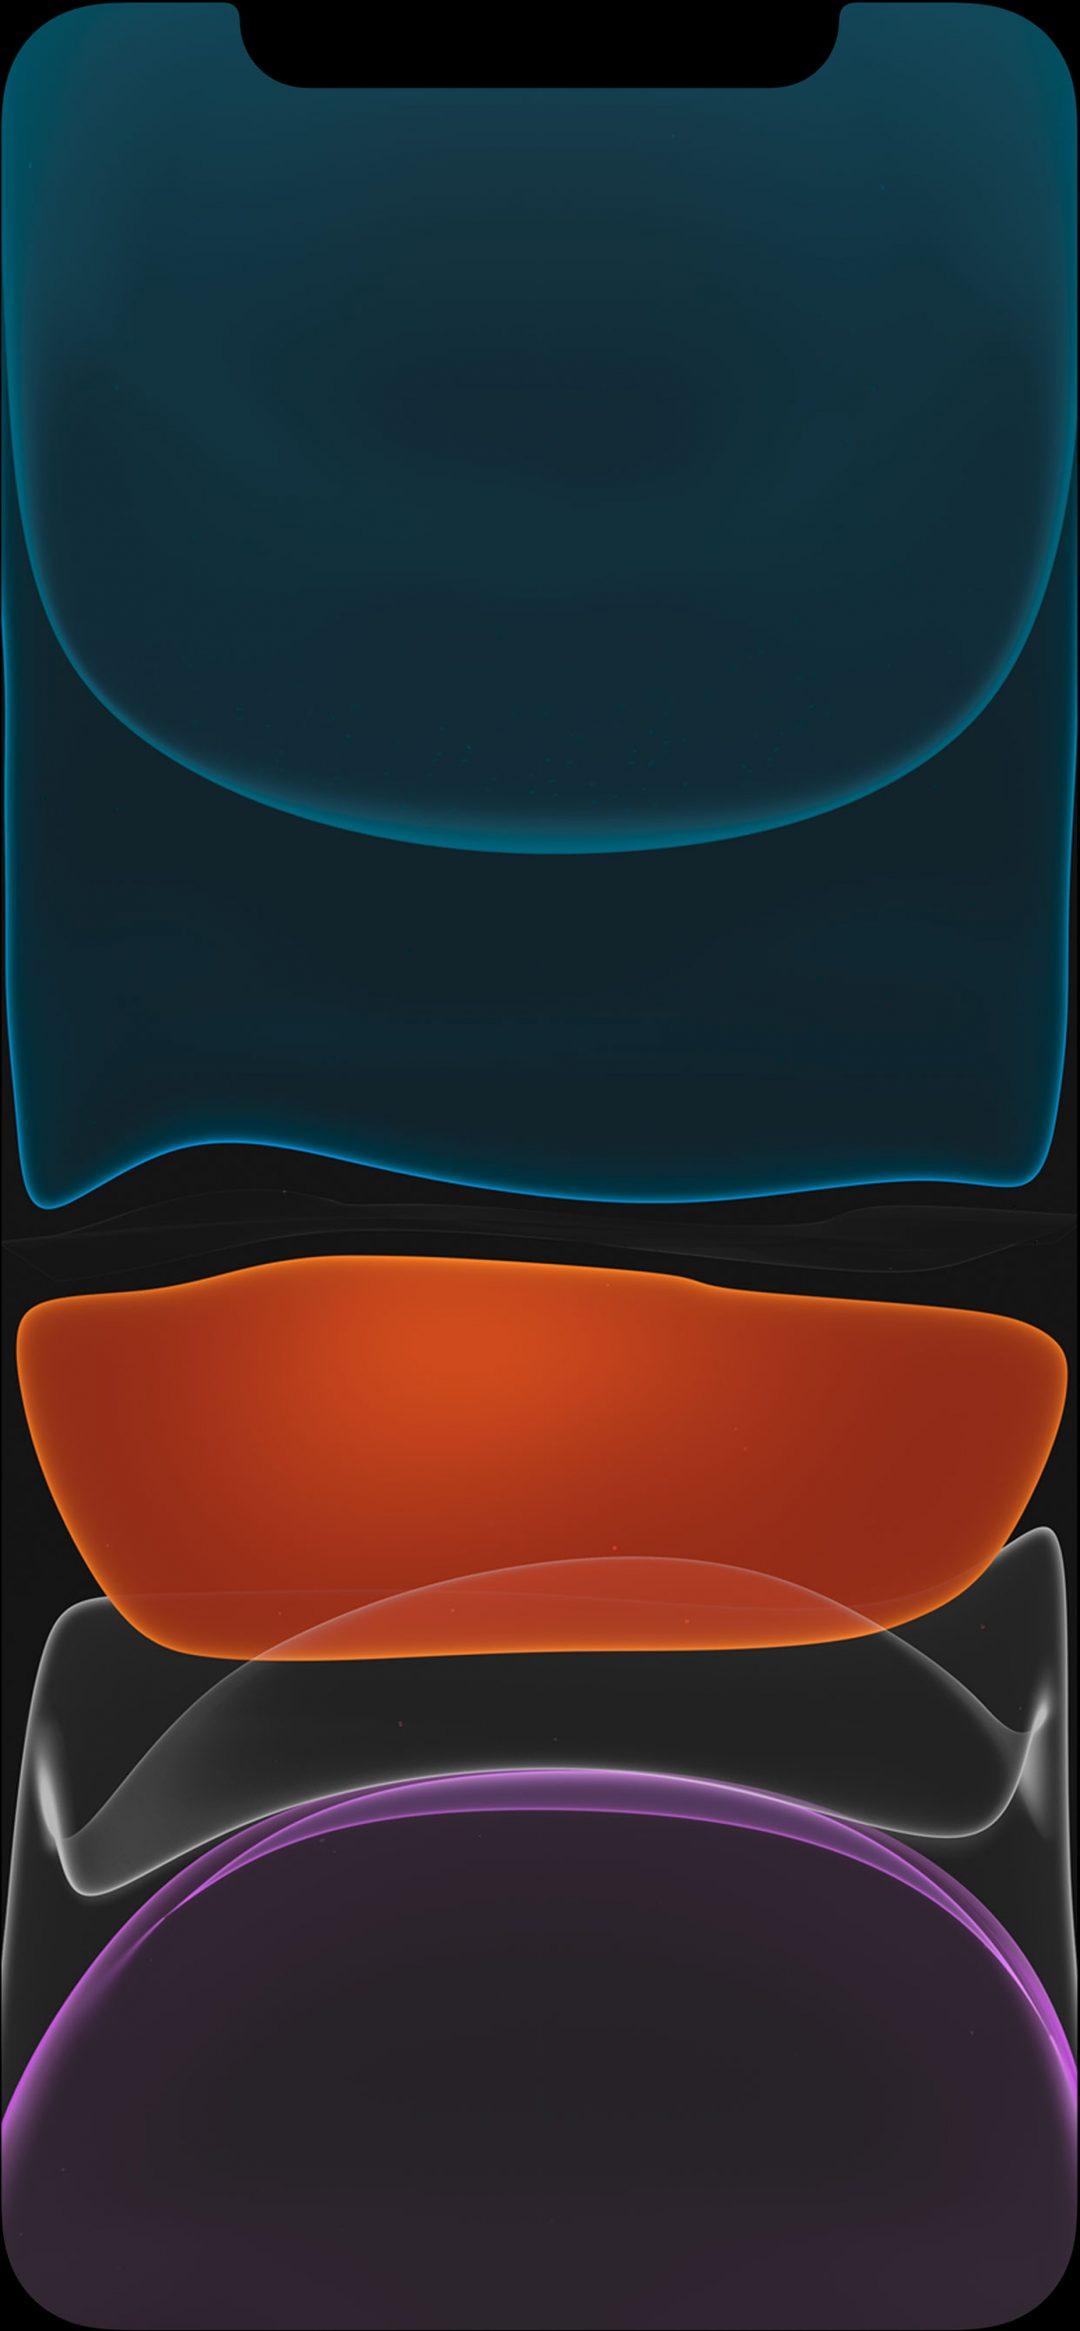 iphone-11-default-wallpaper-ardroiding-11